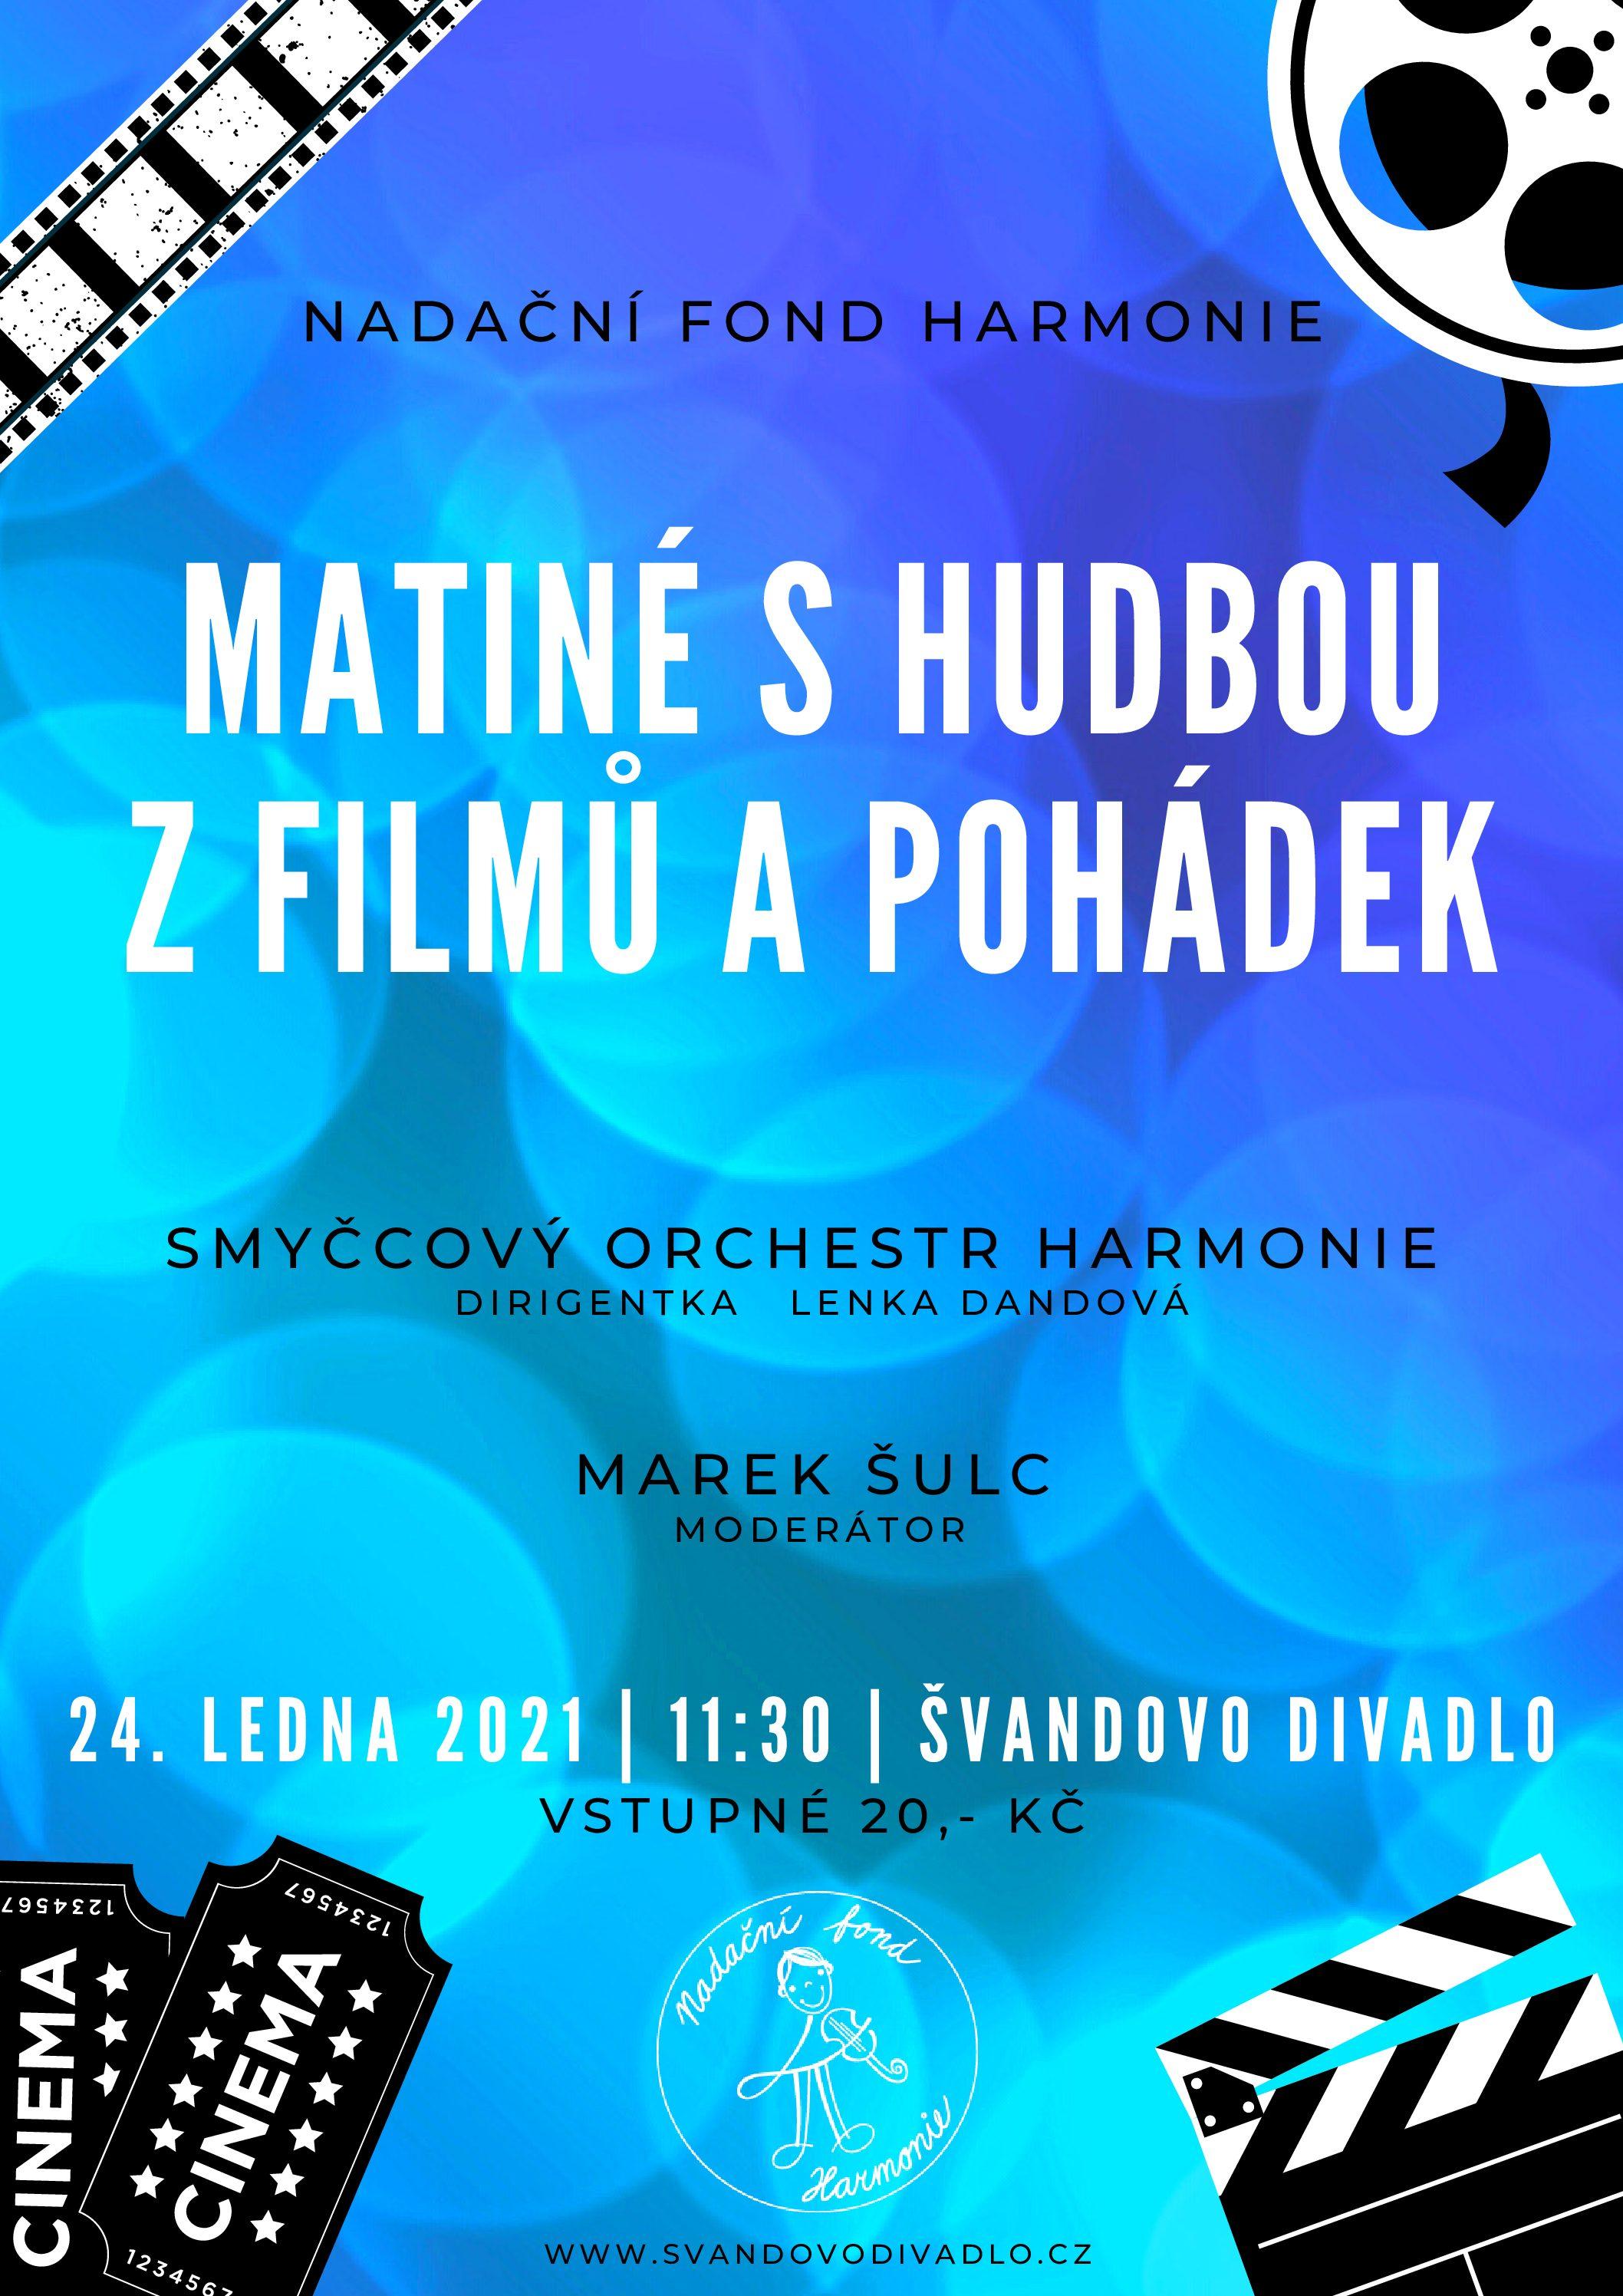 Matiné s hudbou z filmů a pohádek – ZRUŠENO – náhradní termín bude včas oznámen.